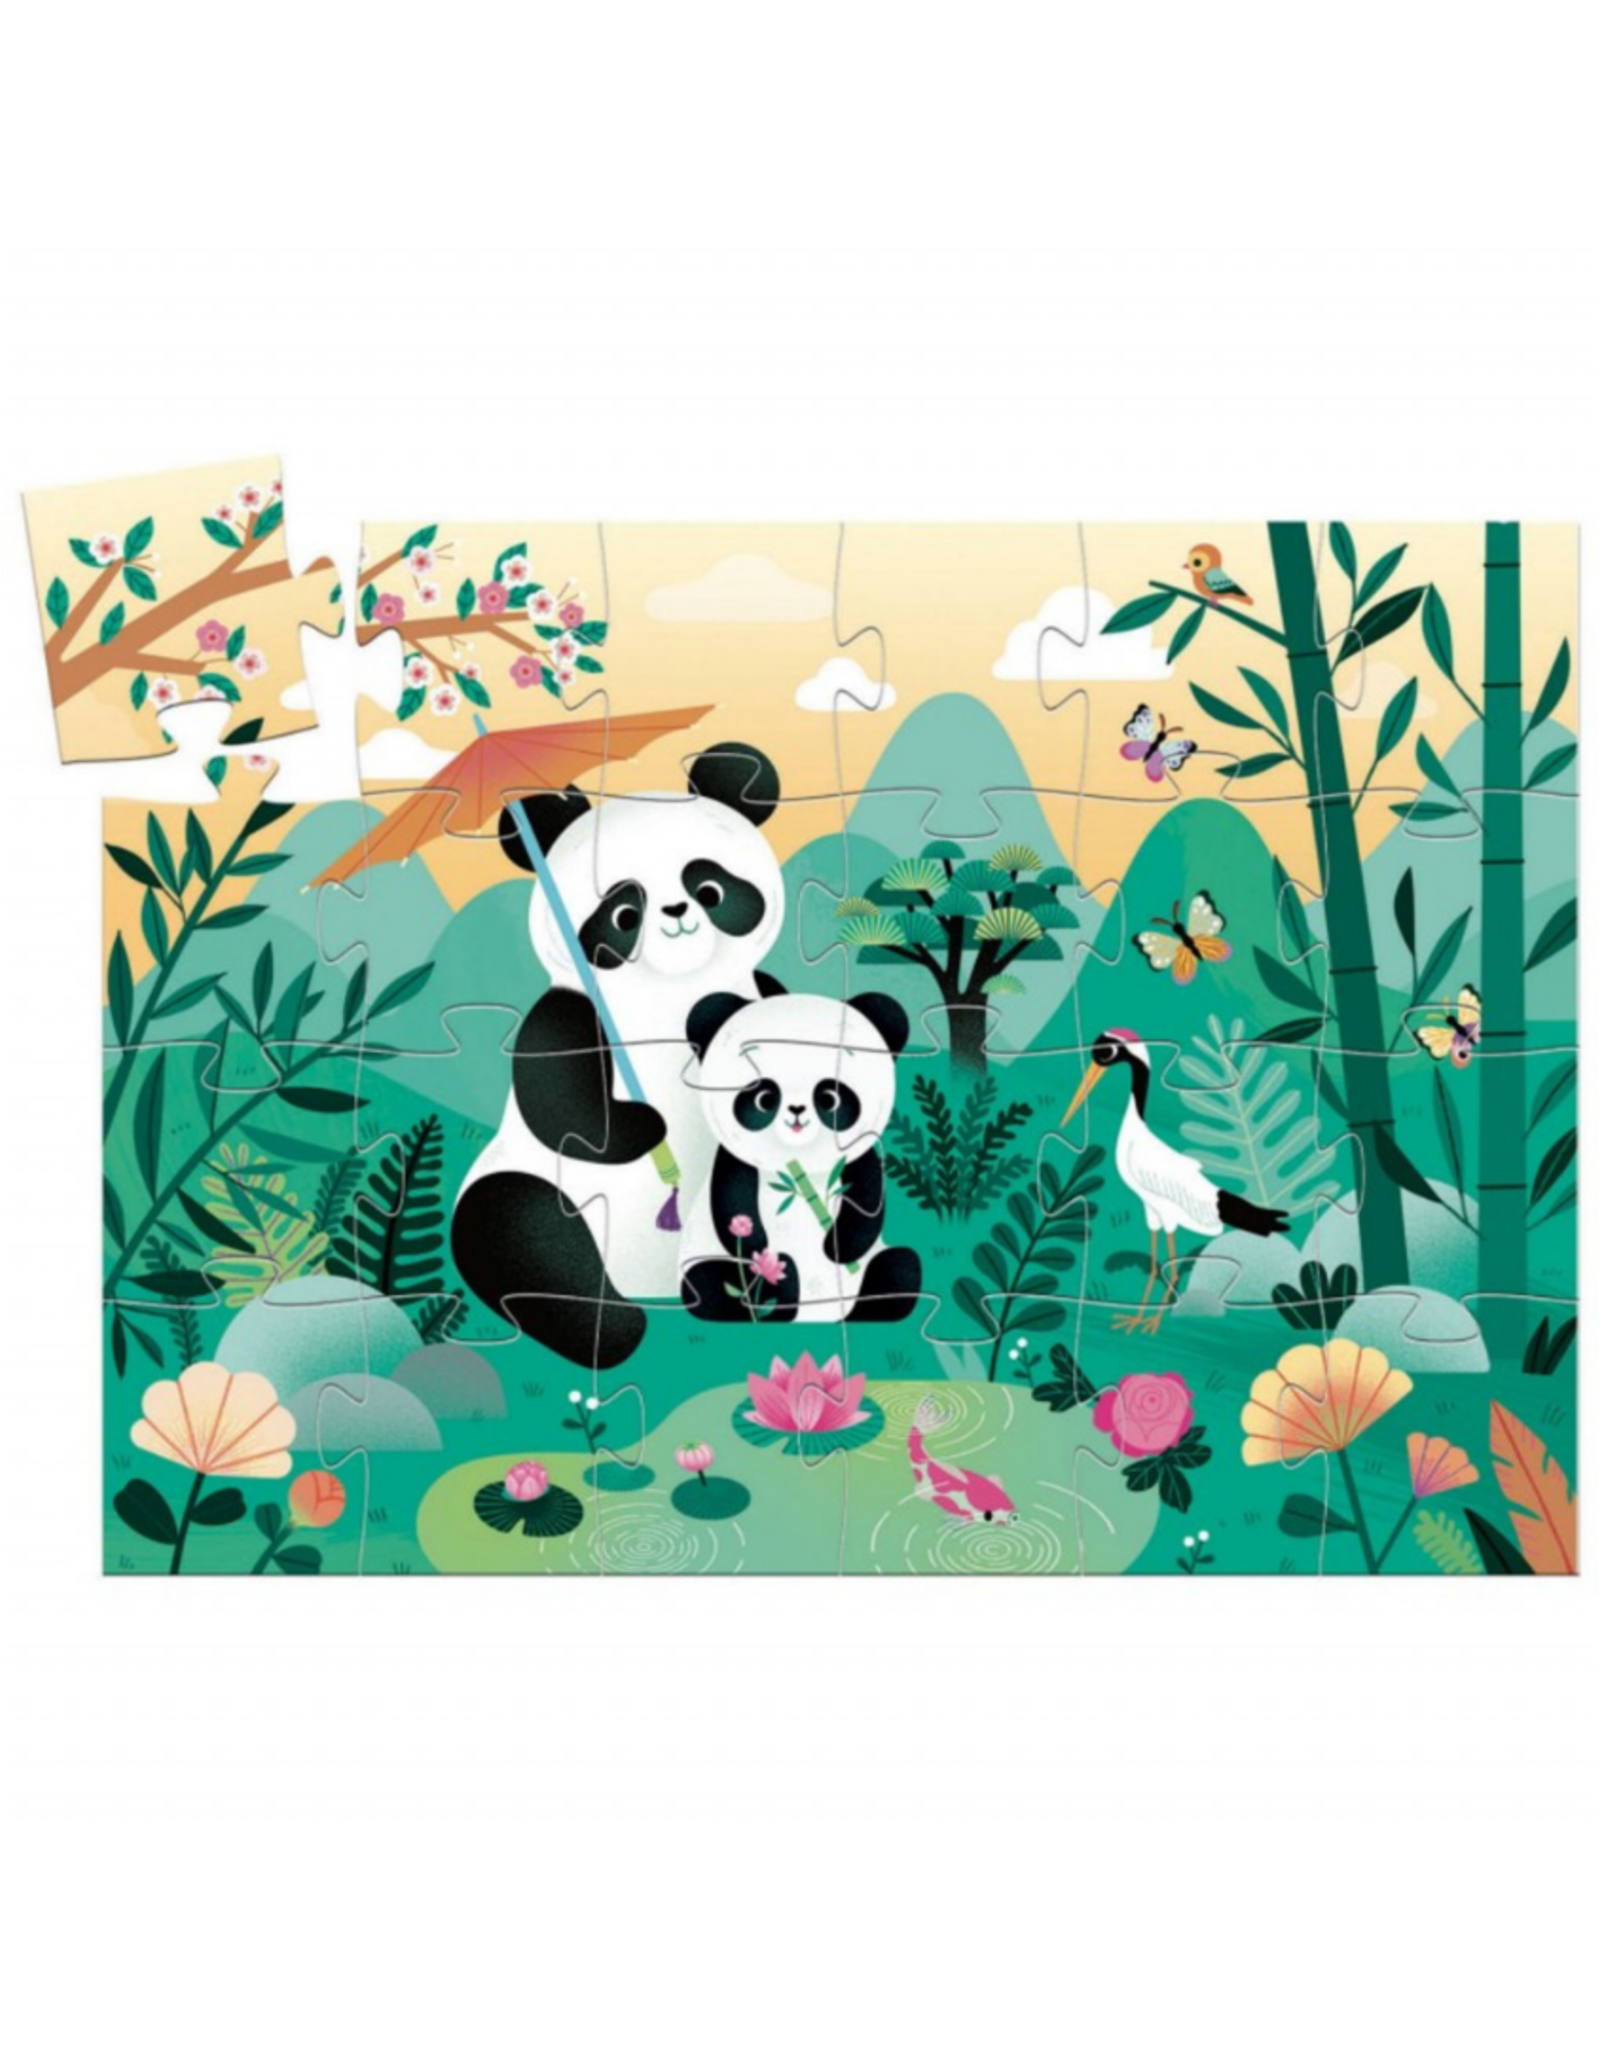 Djeco Silhouette Leo The Panda 24pc